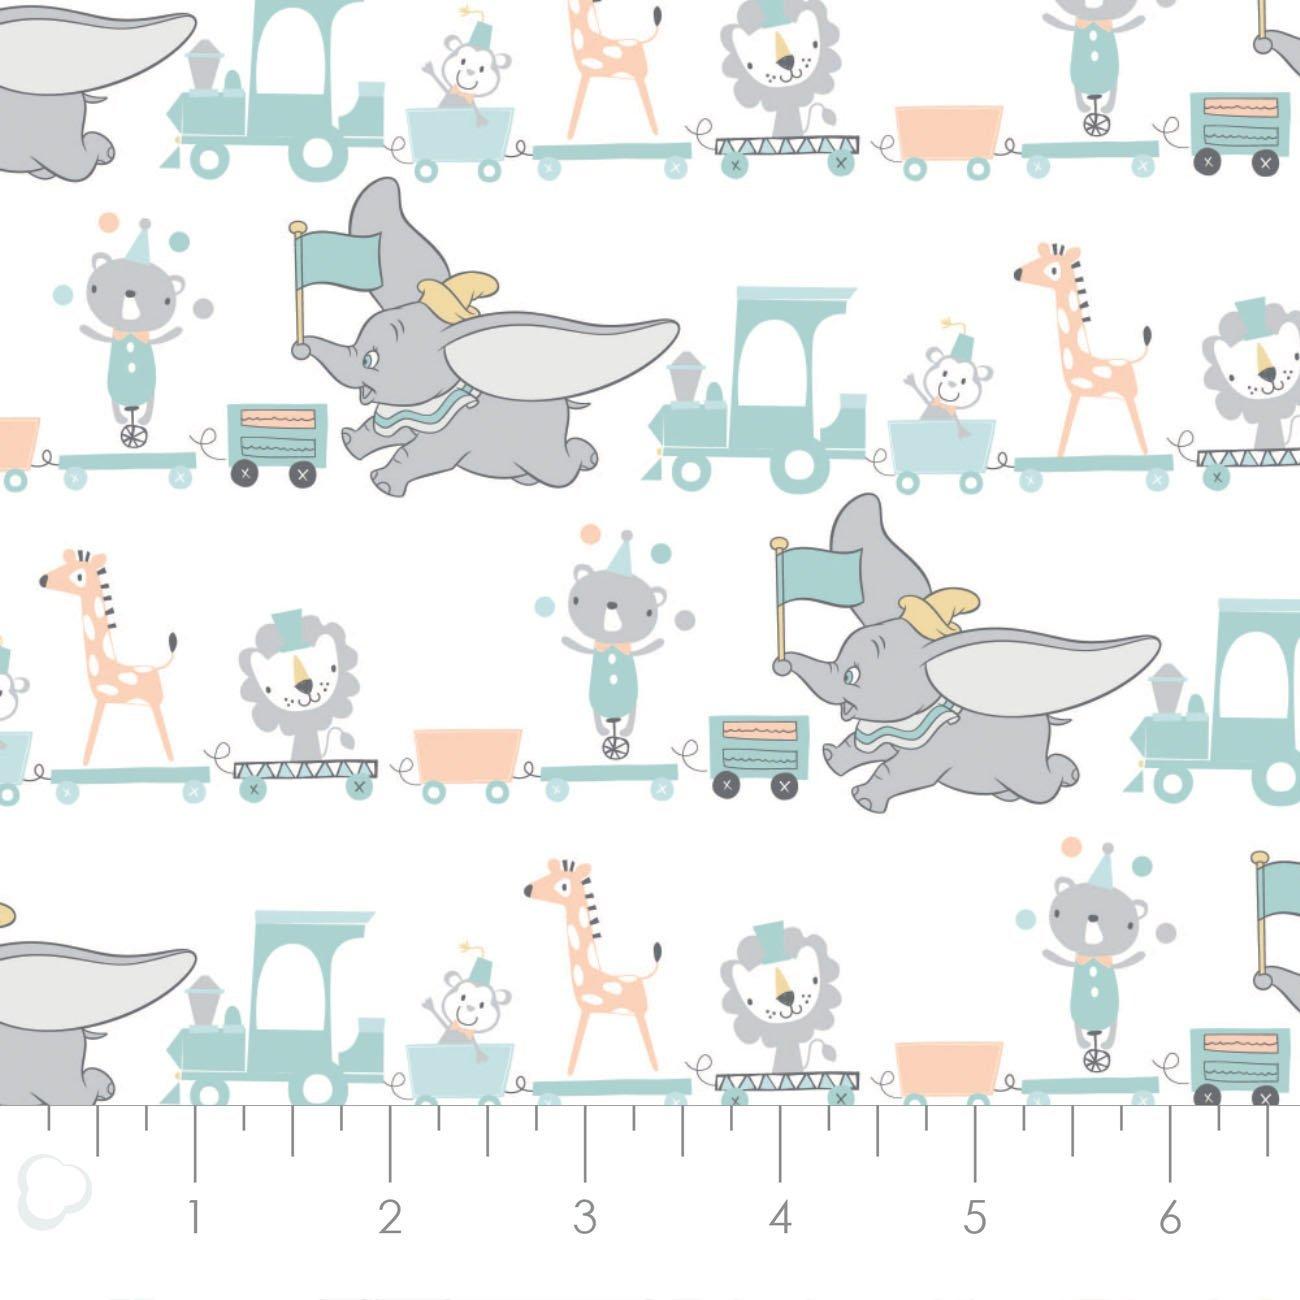 Disney Dumbo My Little Circus 85160303-01 Toy Parade